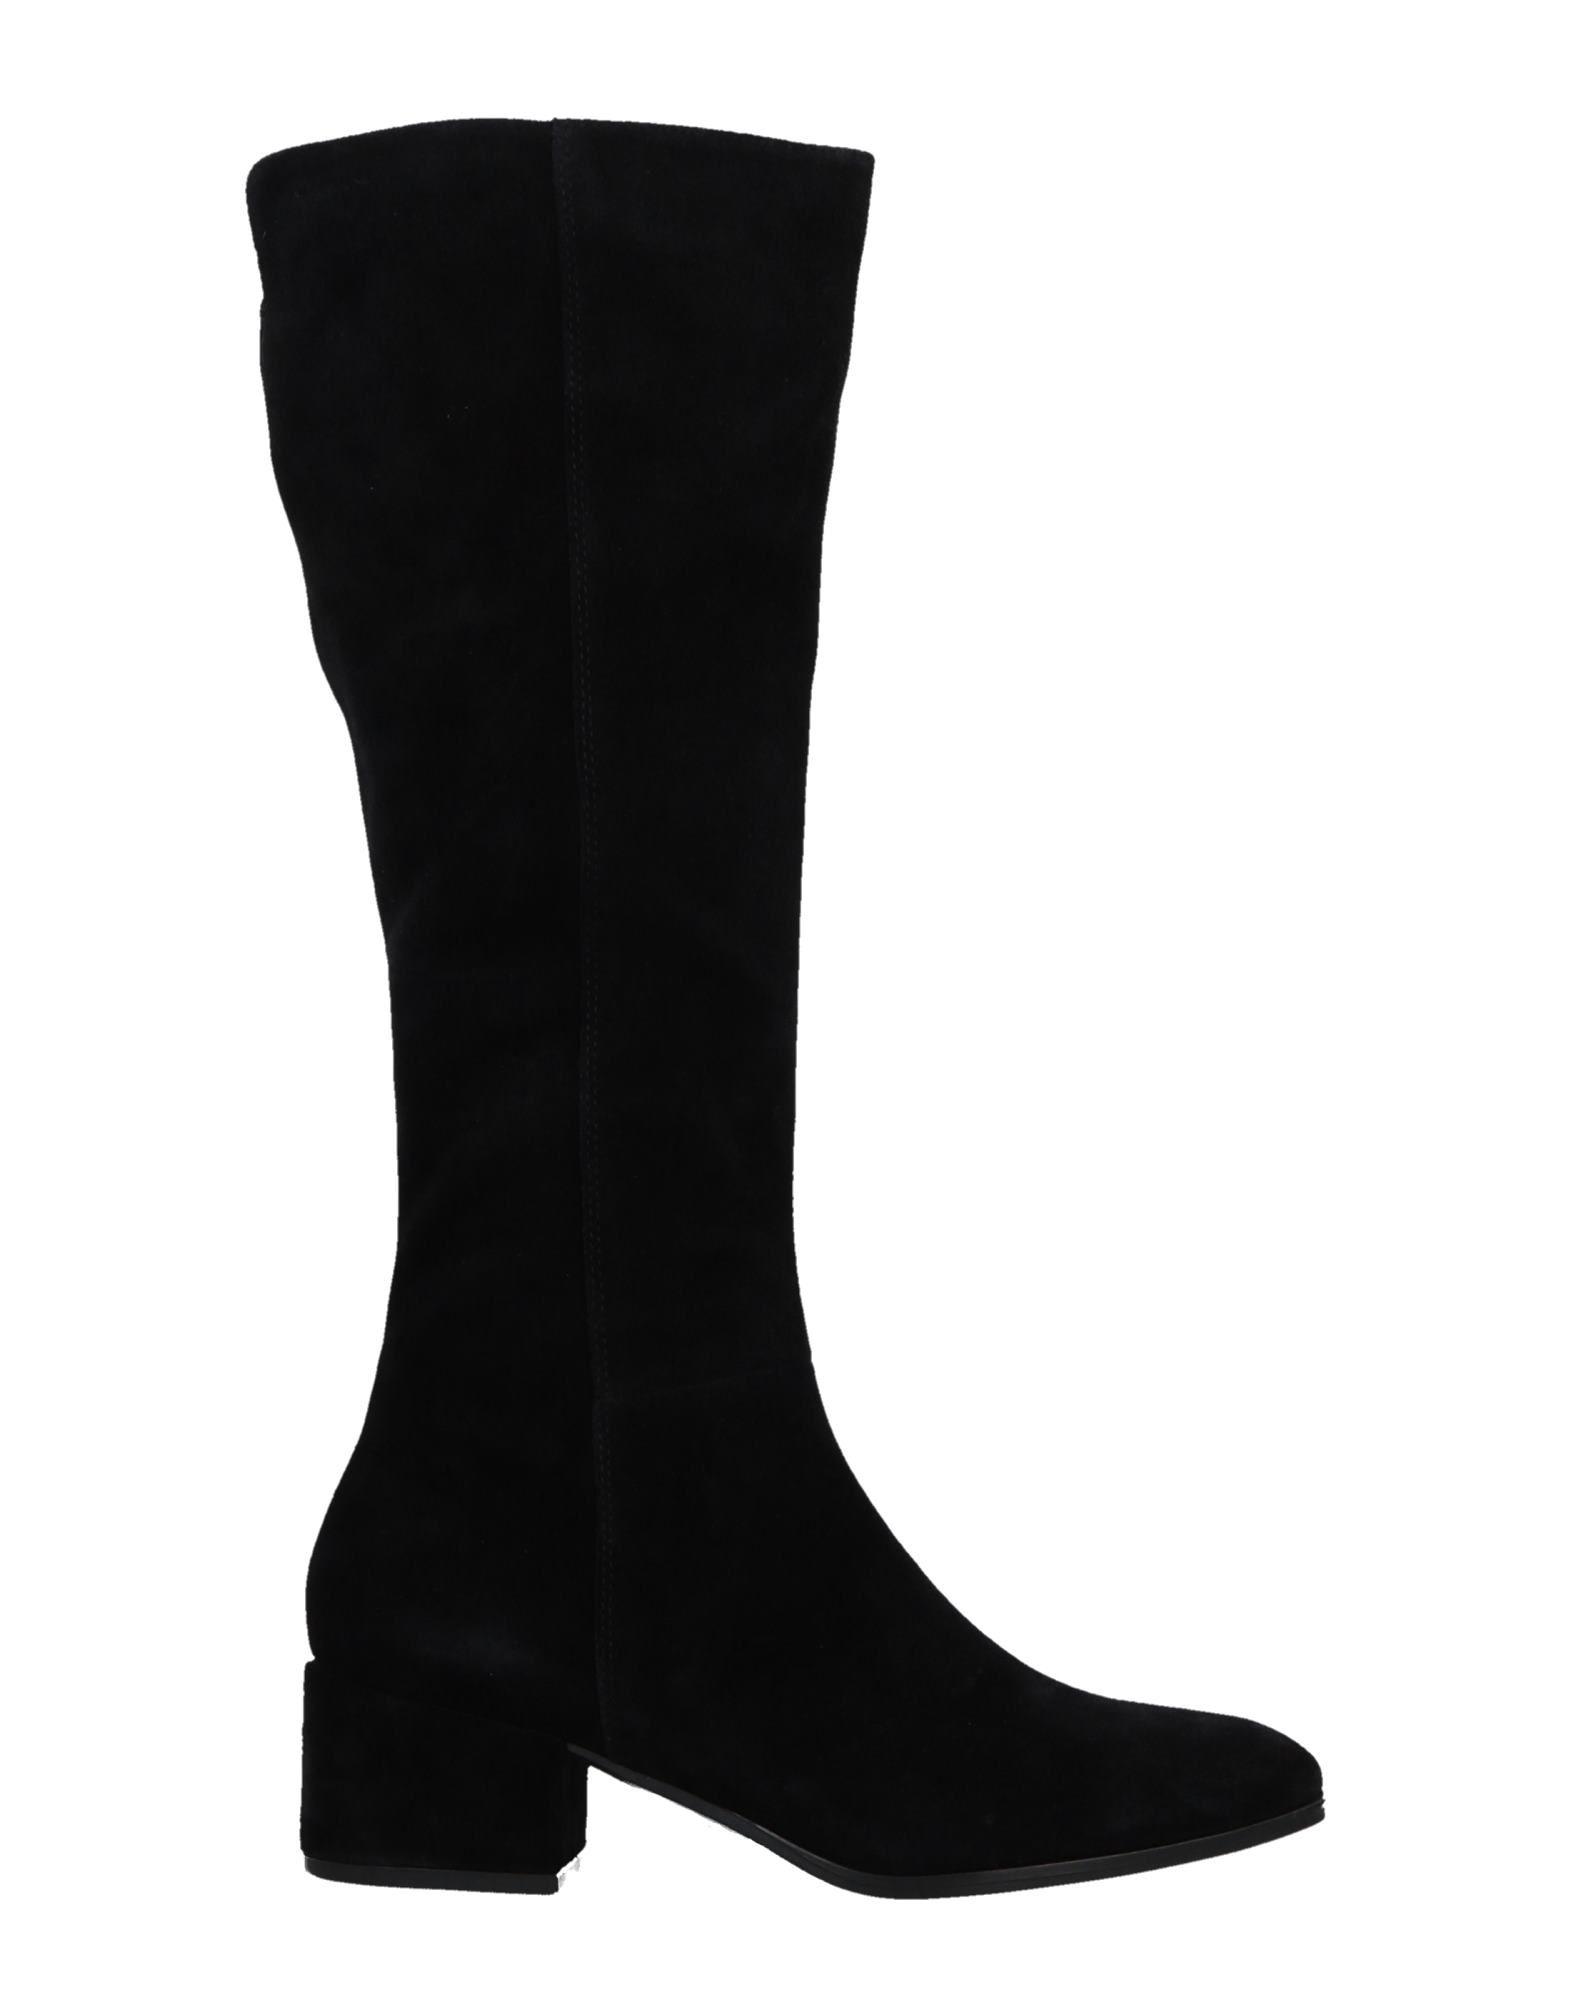 Stivali Vagabond Shoemakers Donna - 11512869FA